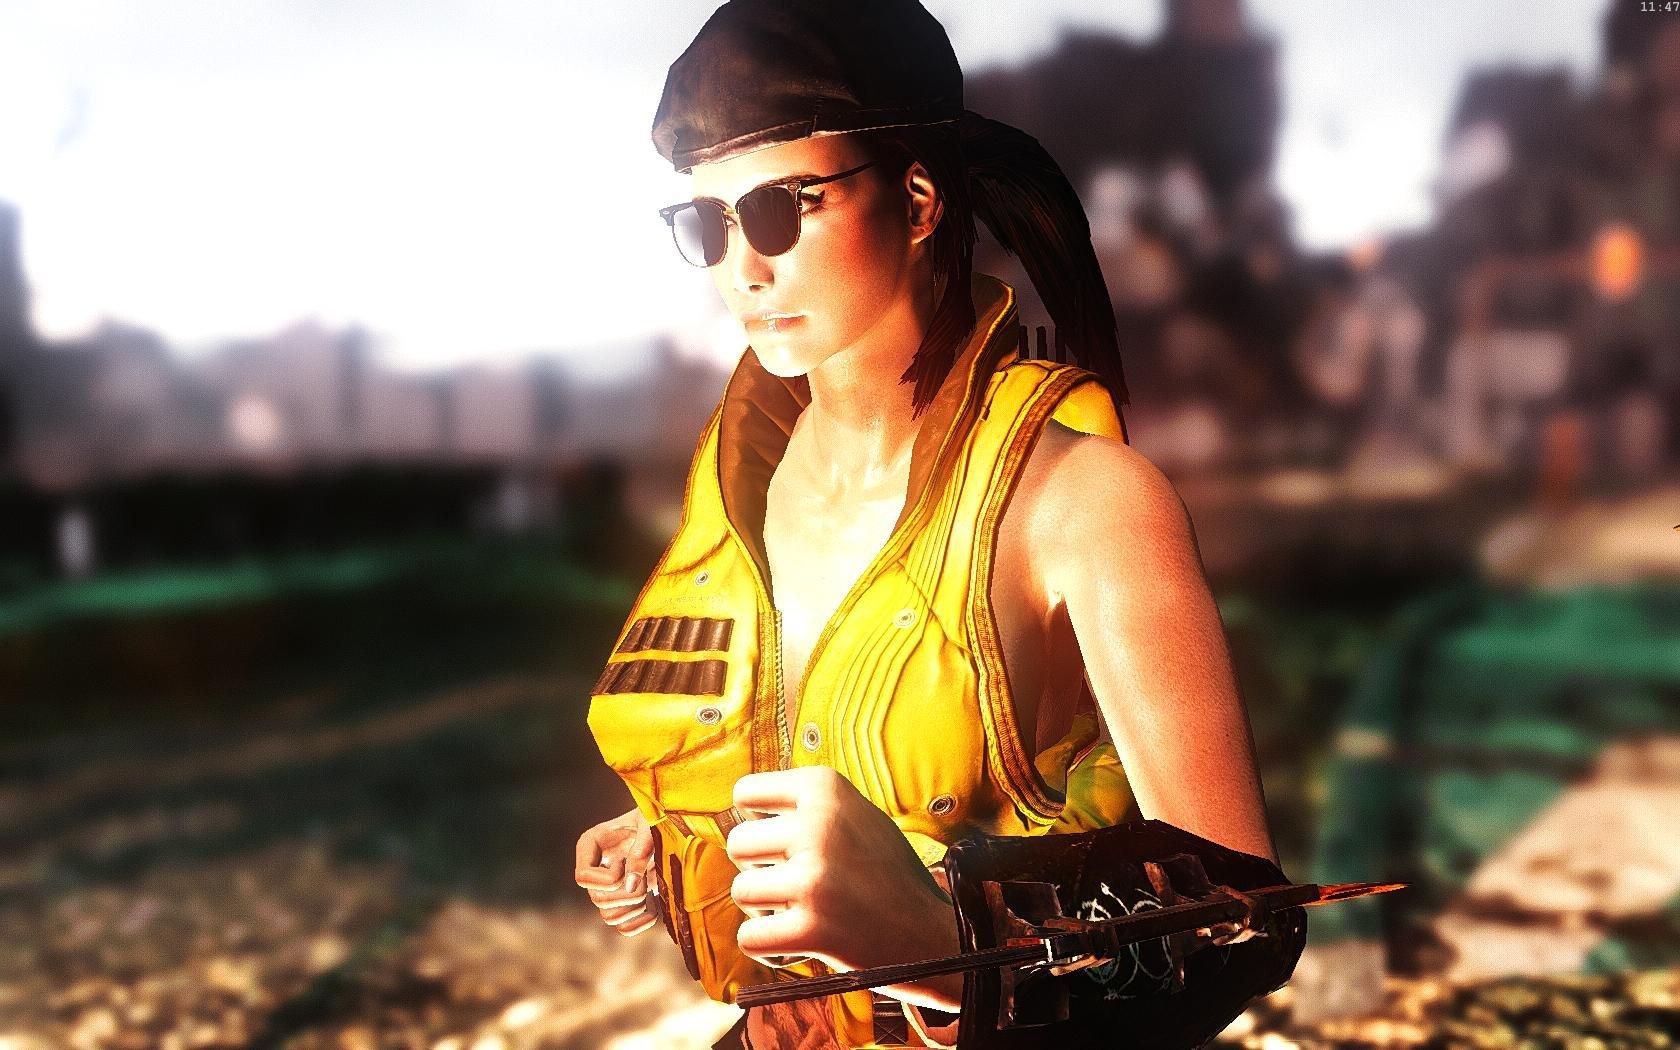 Fallout4 2019-03-25 11-47-35-36